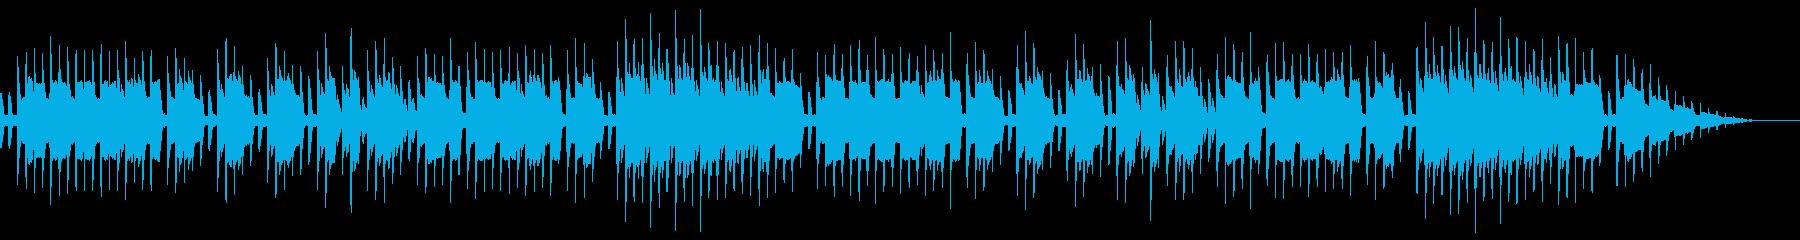 8bitクラシック-Je te veuxの再生済みの波形